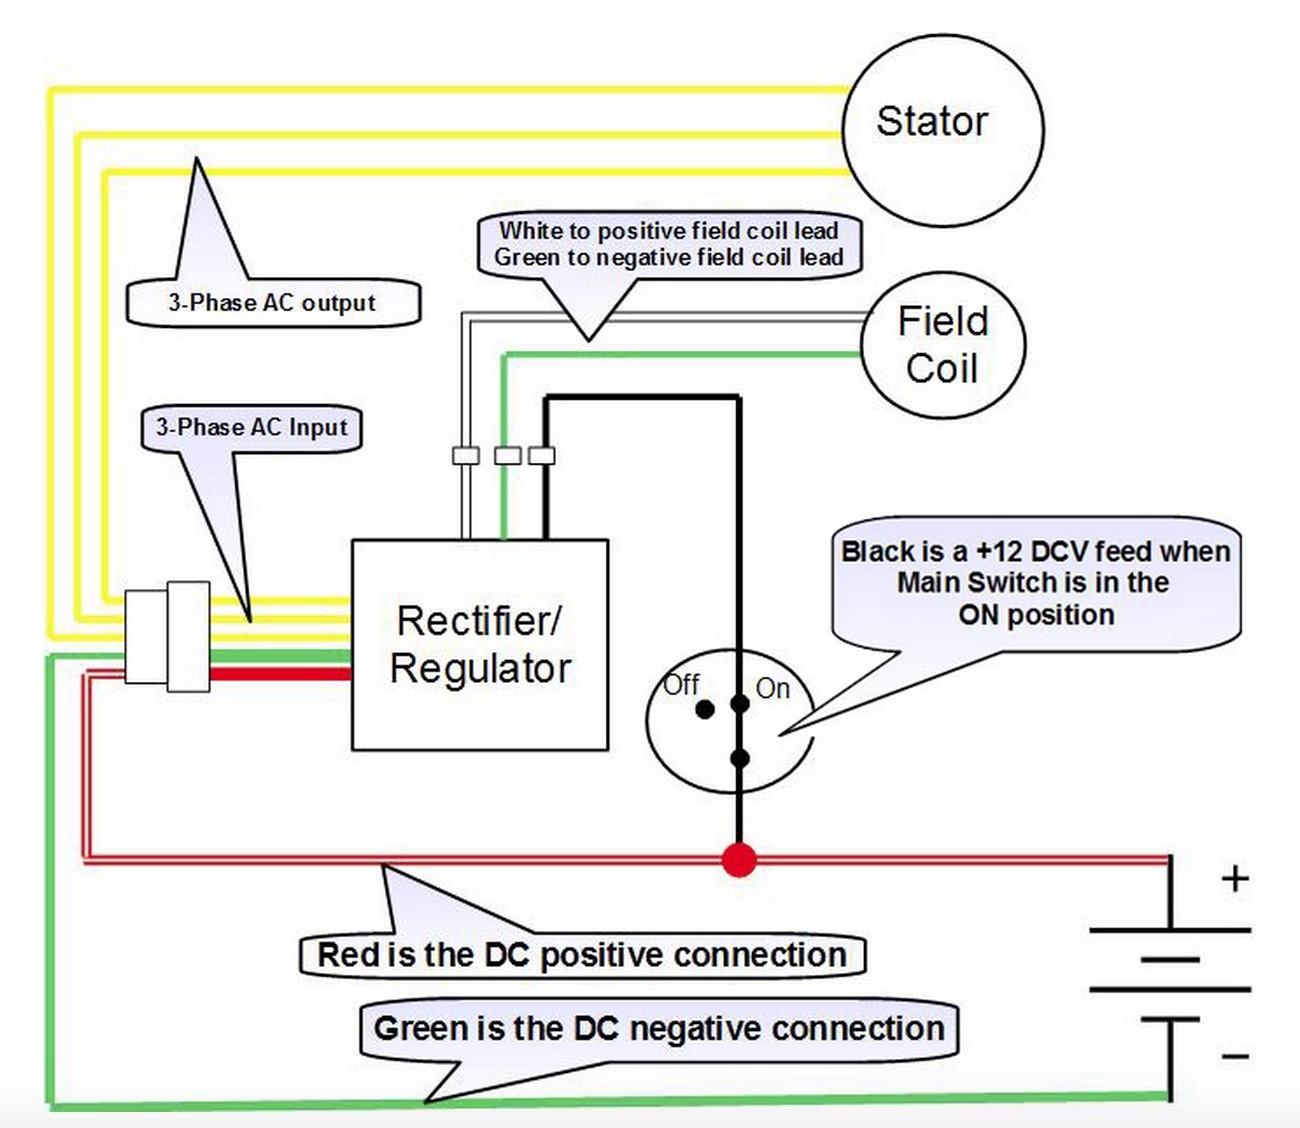 hight resolution of honda 390 wiring diagram simple wiring schema honda gx240 parts breakdown honda gx390 wiring